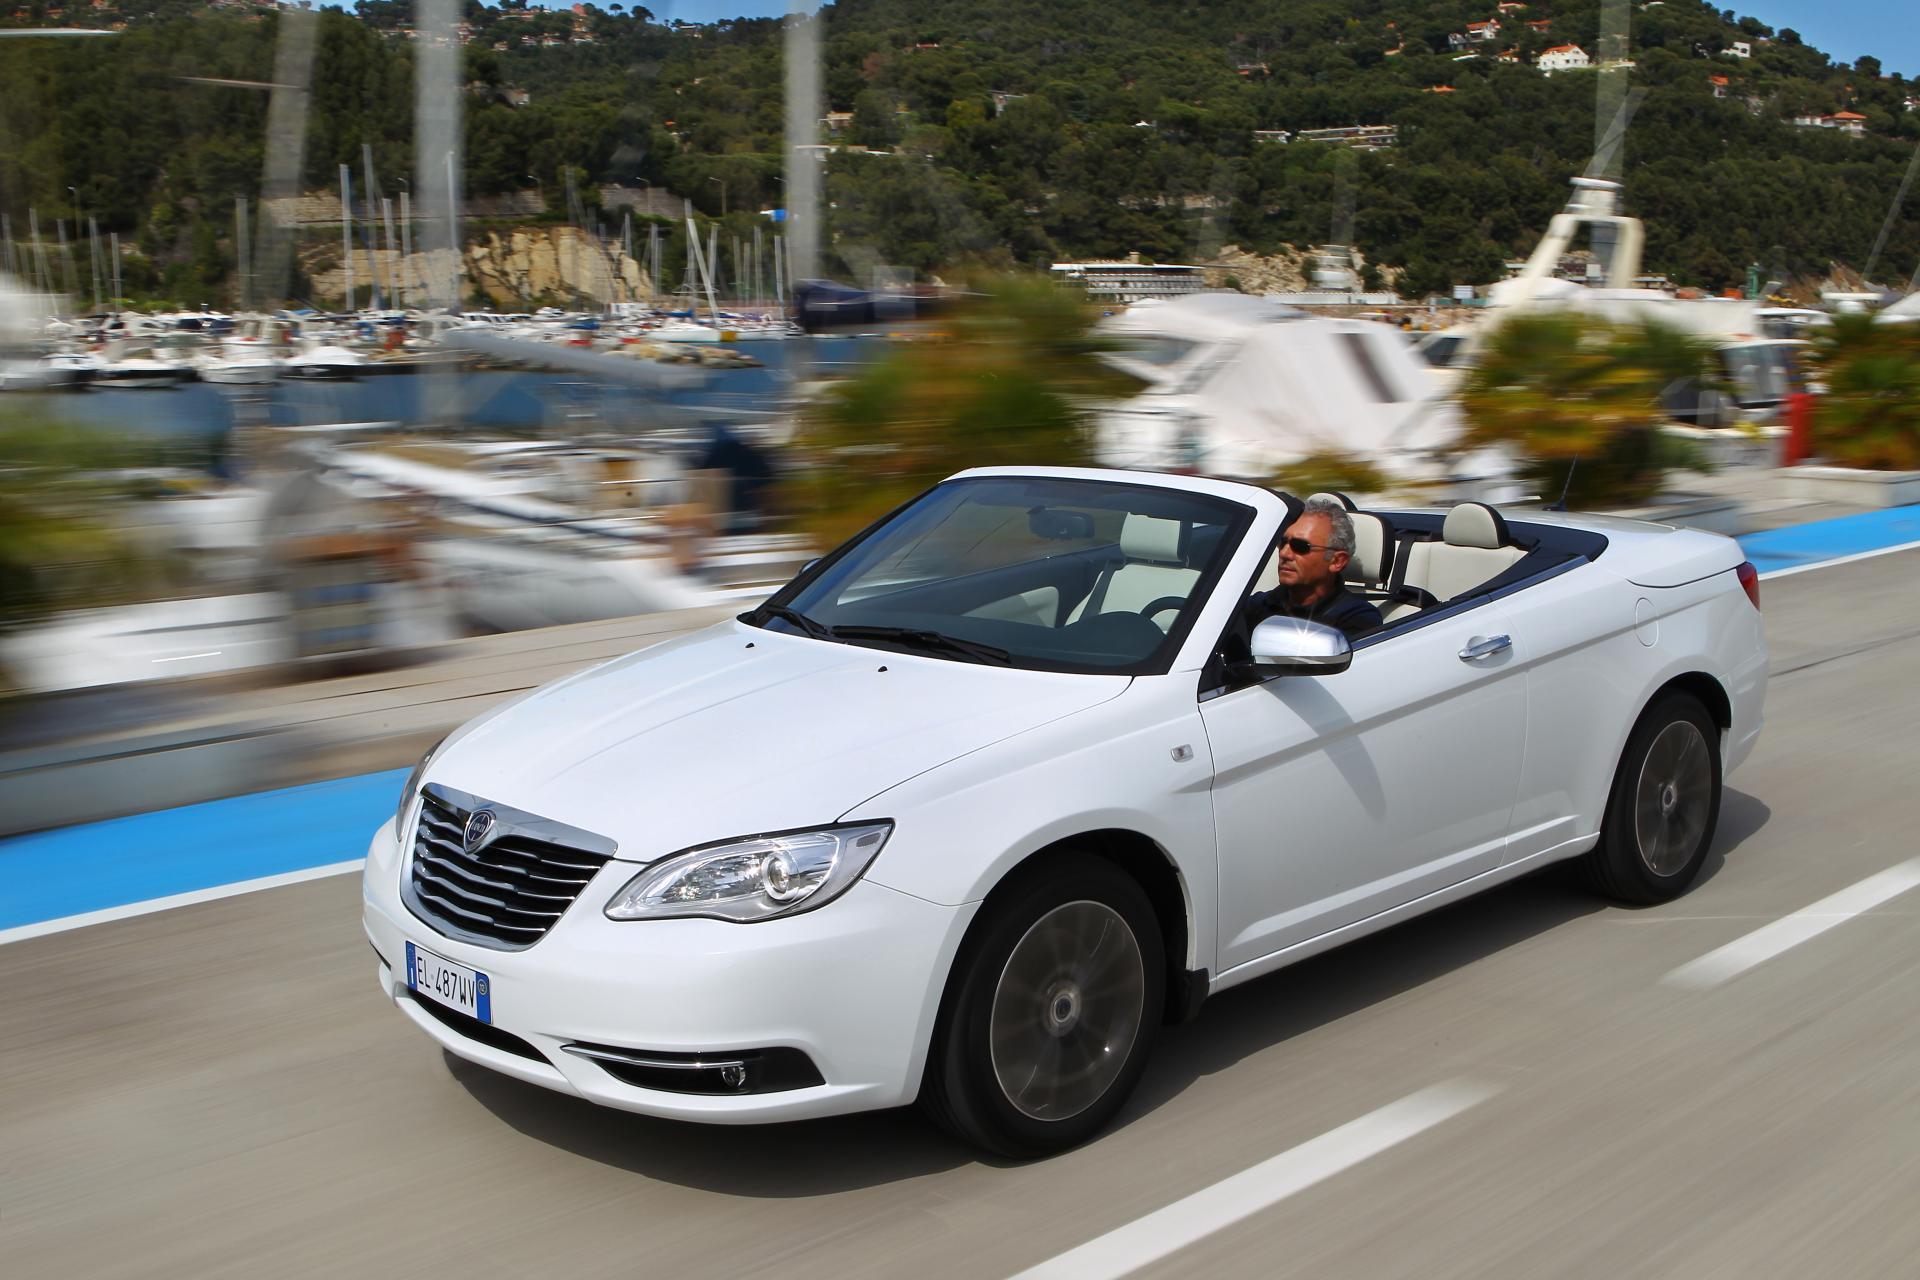 2013 Lancia Flavia News And Information